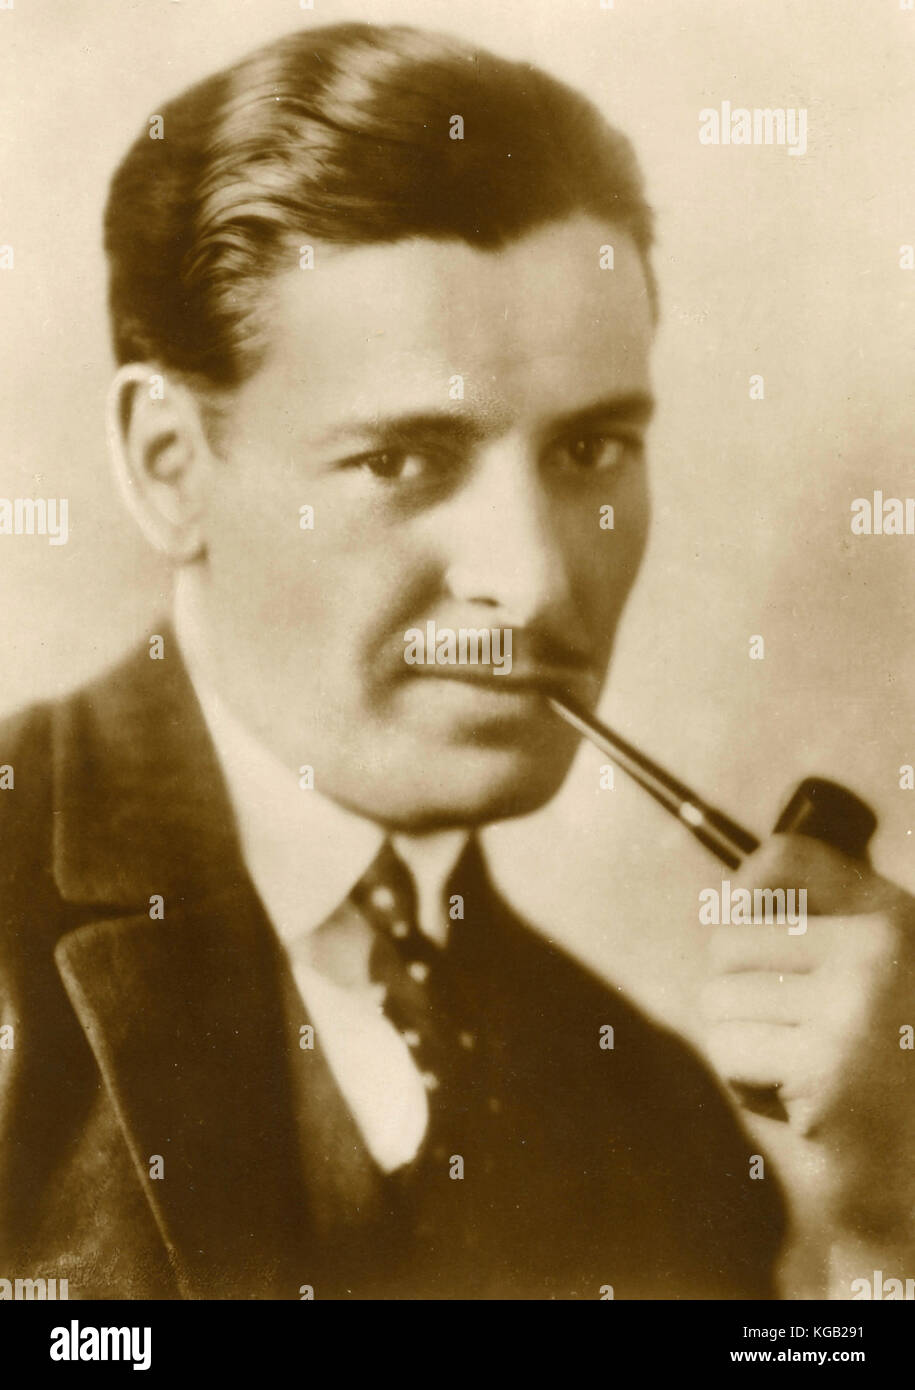 English actor Ronald Colman - Stock Image